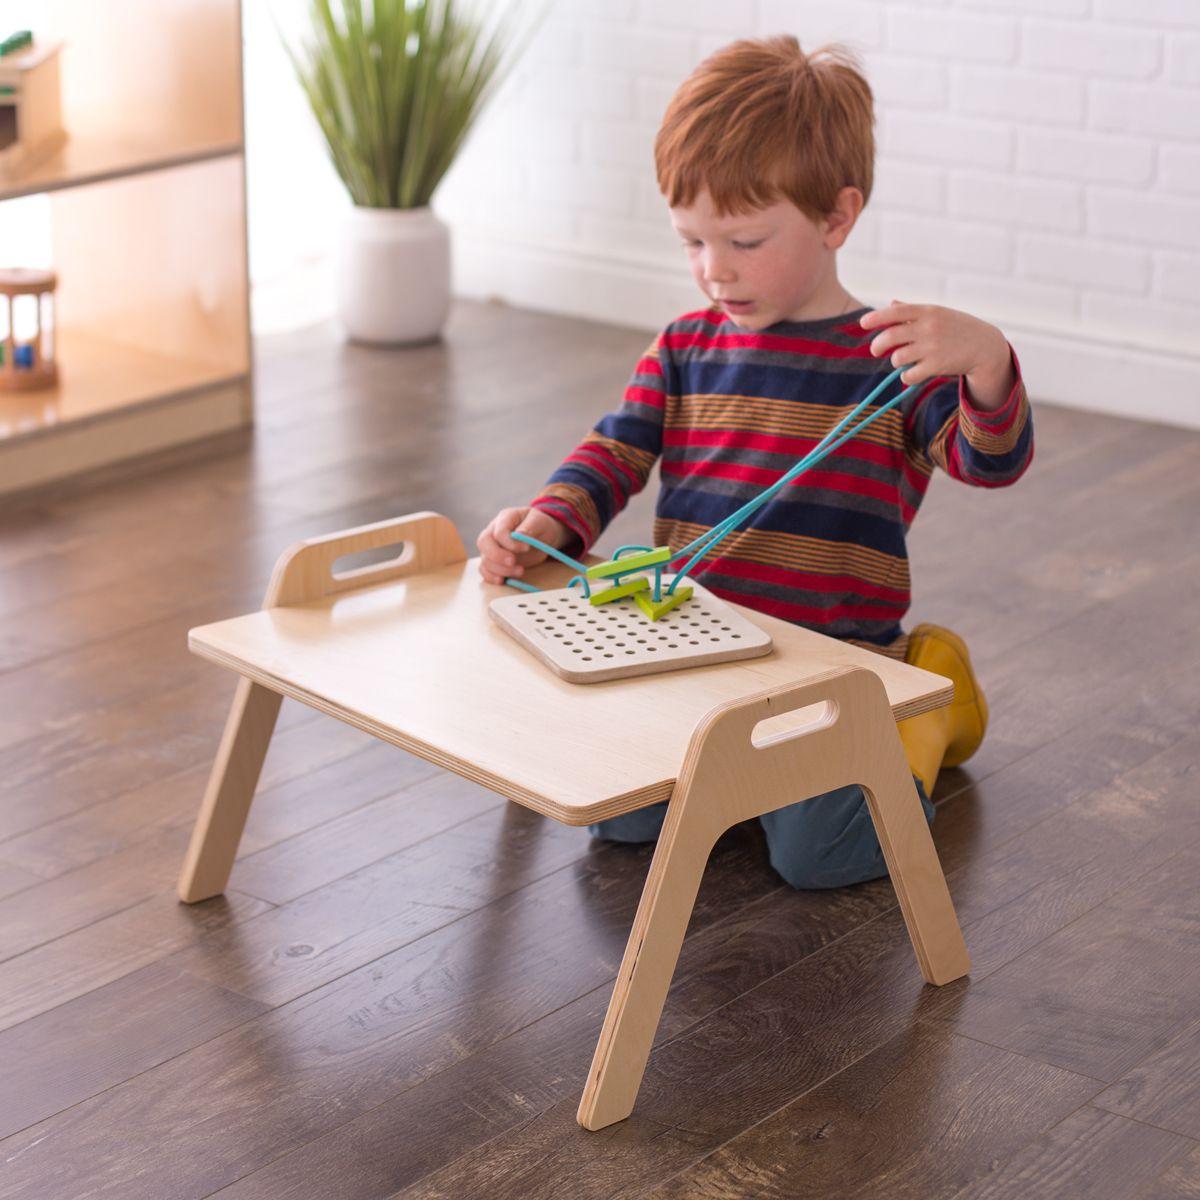 Chowki Floor Table Montessori Toddler Furniture Toddler Furniture Floor Table